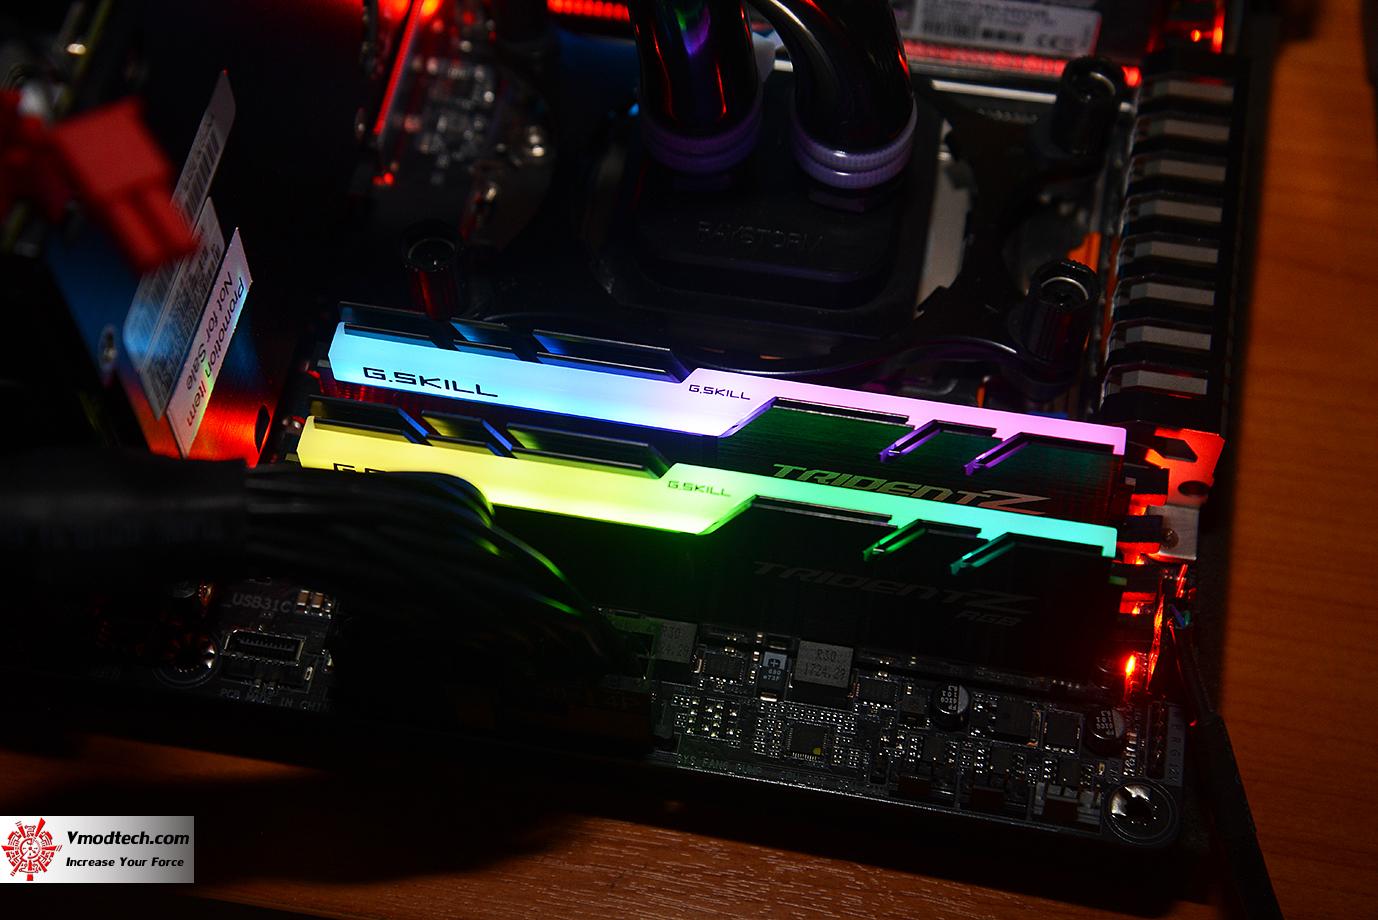 dsc 2987 G.SKILL Trident Z RGB DDR4 3200MHz 32GB (8GBx4) Quad Channel Review